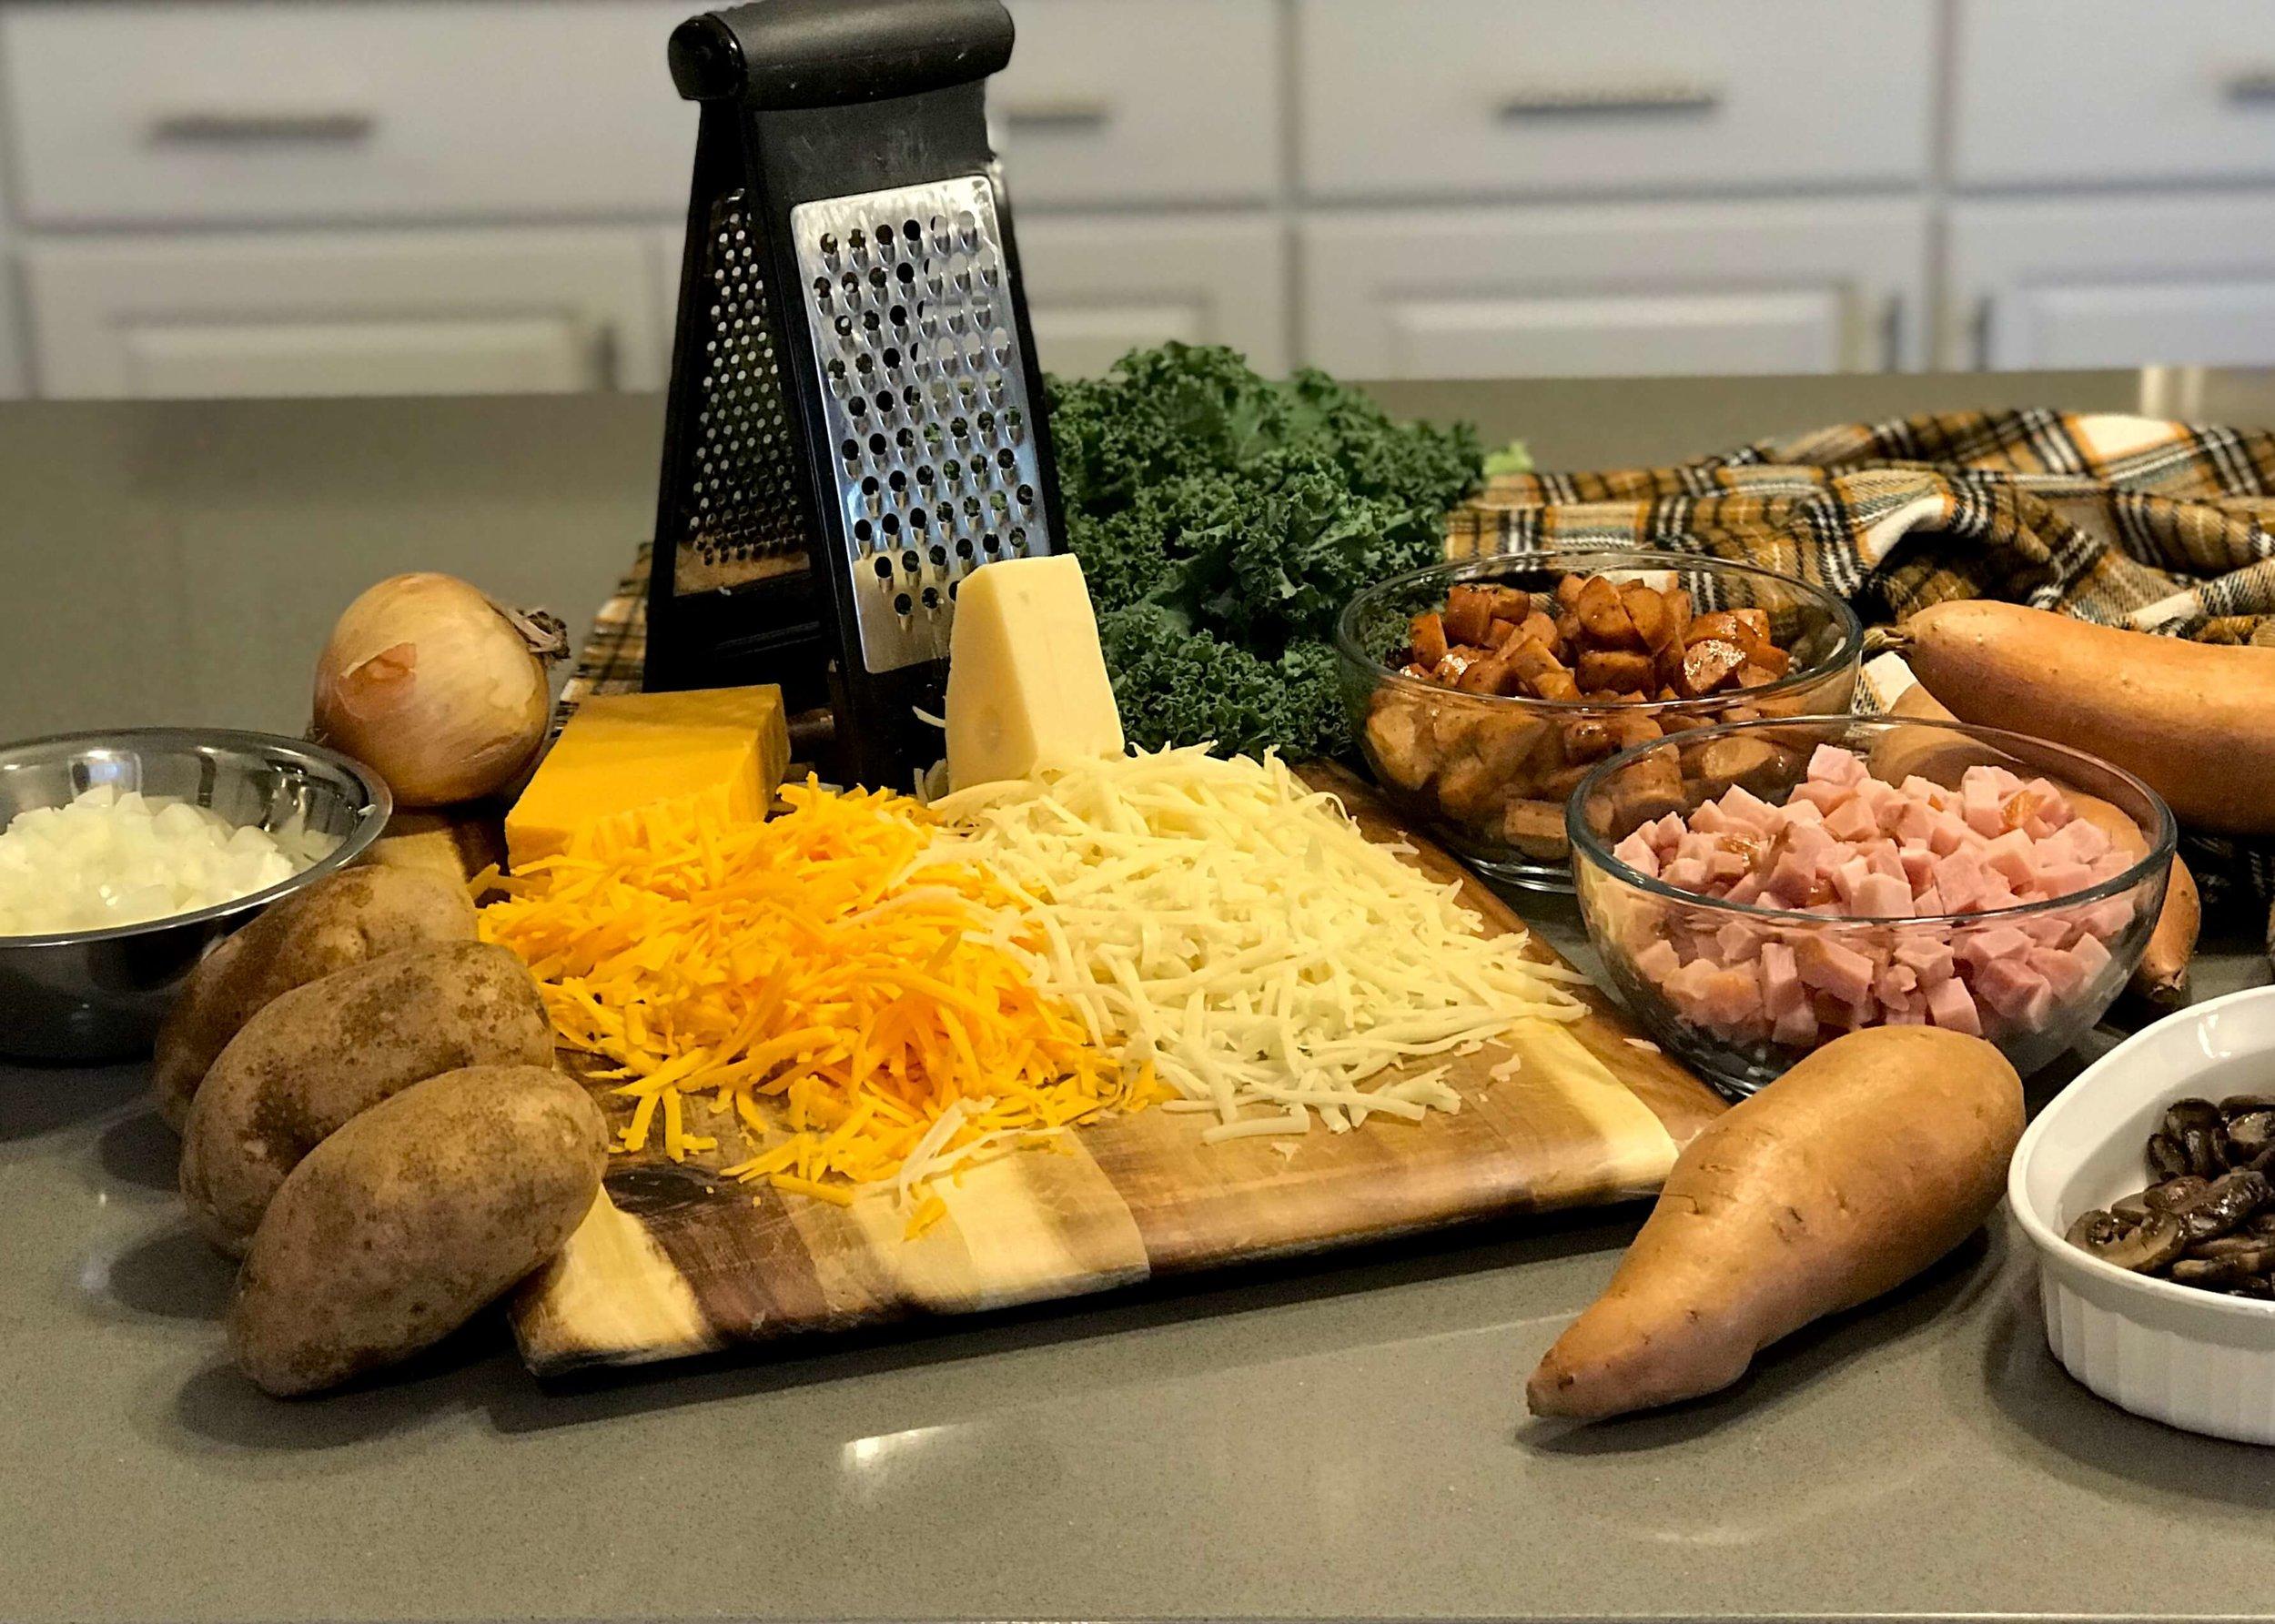 Ingredients for Au Gratin Potatoes and Ham. Photo credit: Anita McVey/Picnic Life Foodie